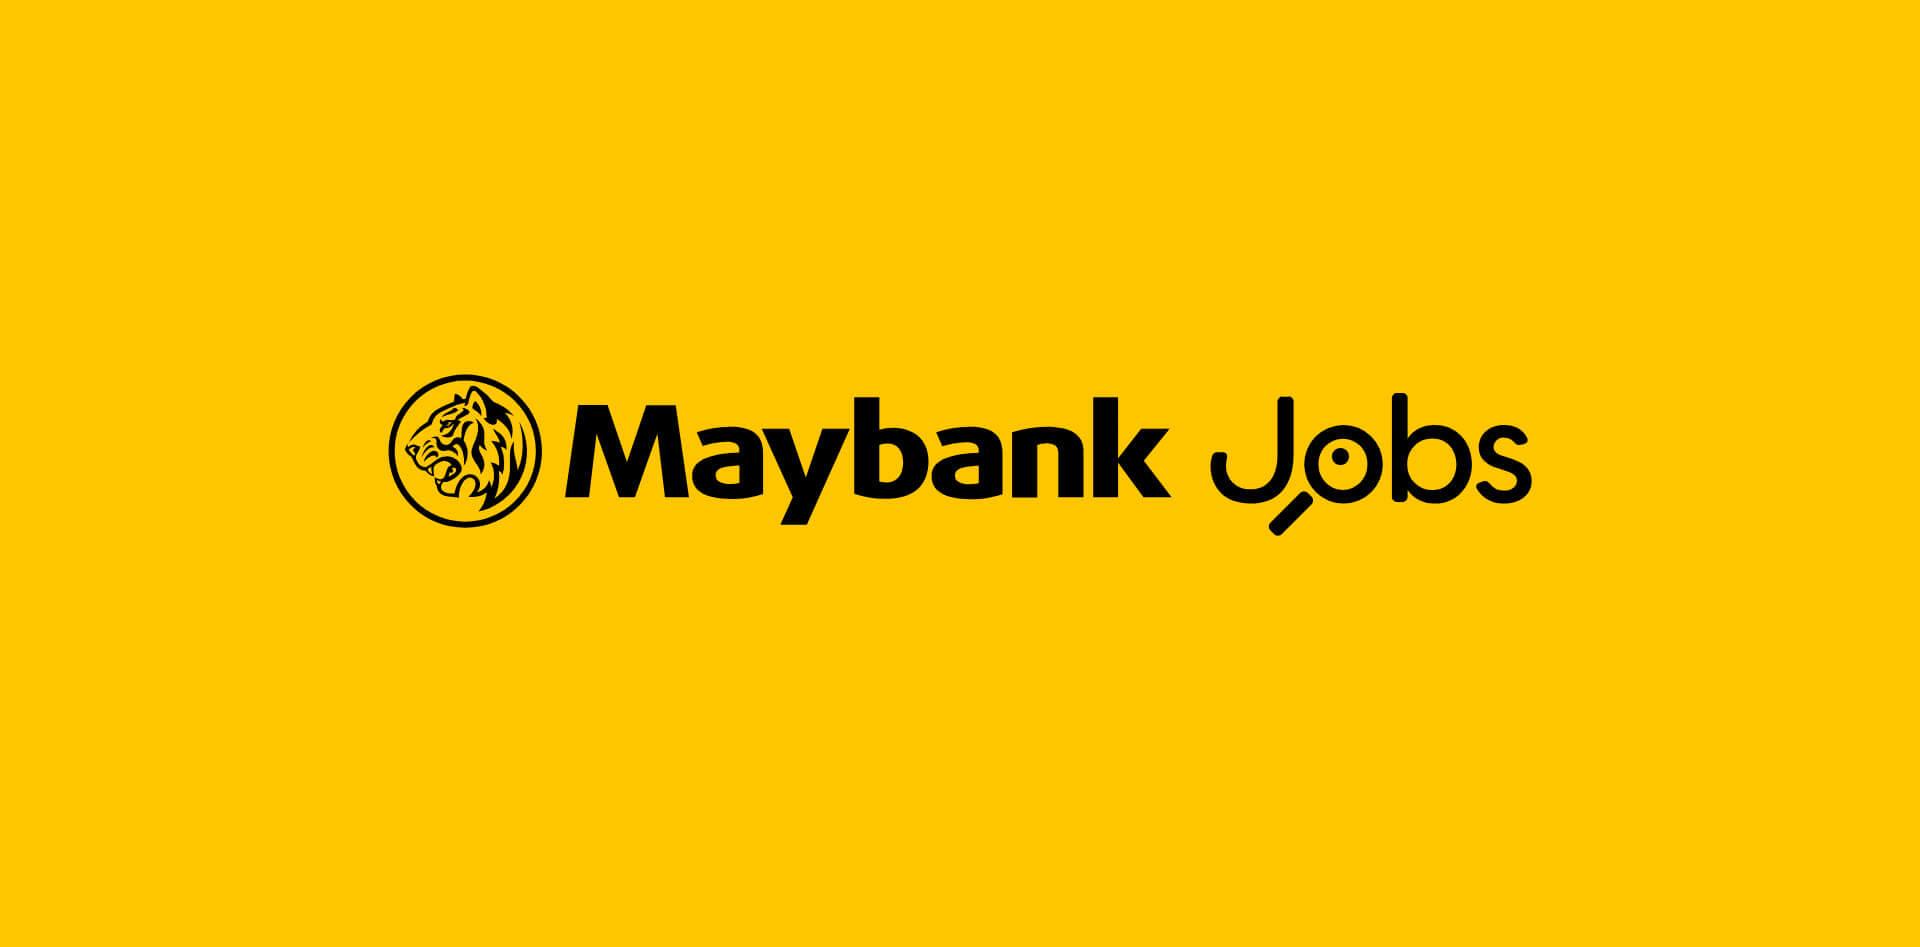 maybank investment bank berhad careerbuilder